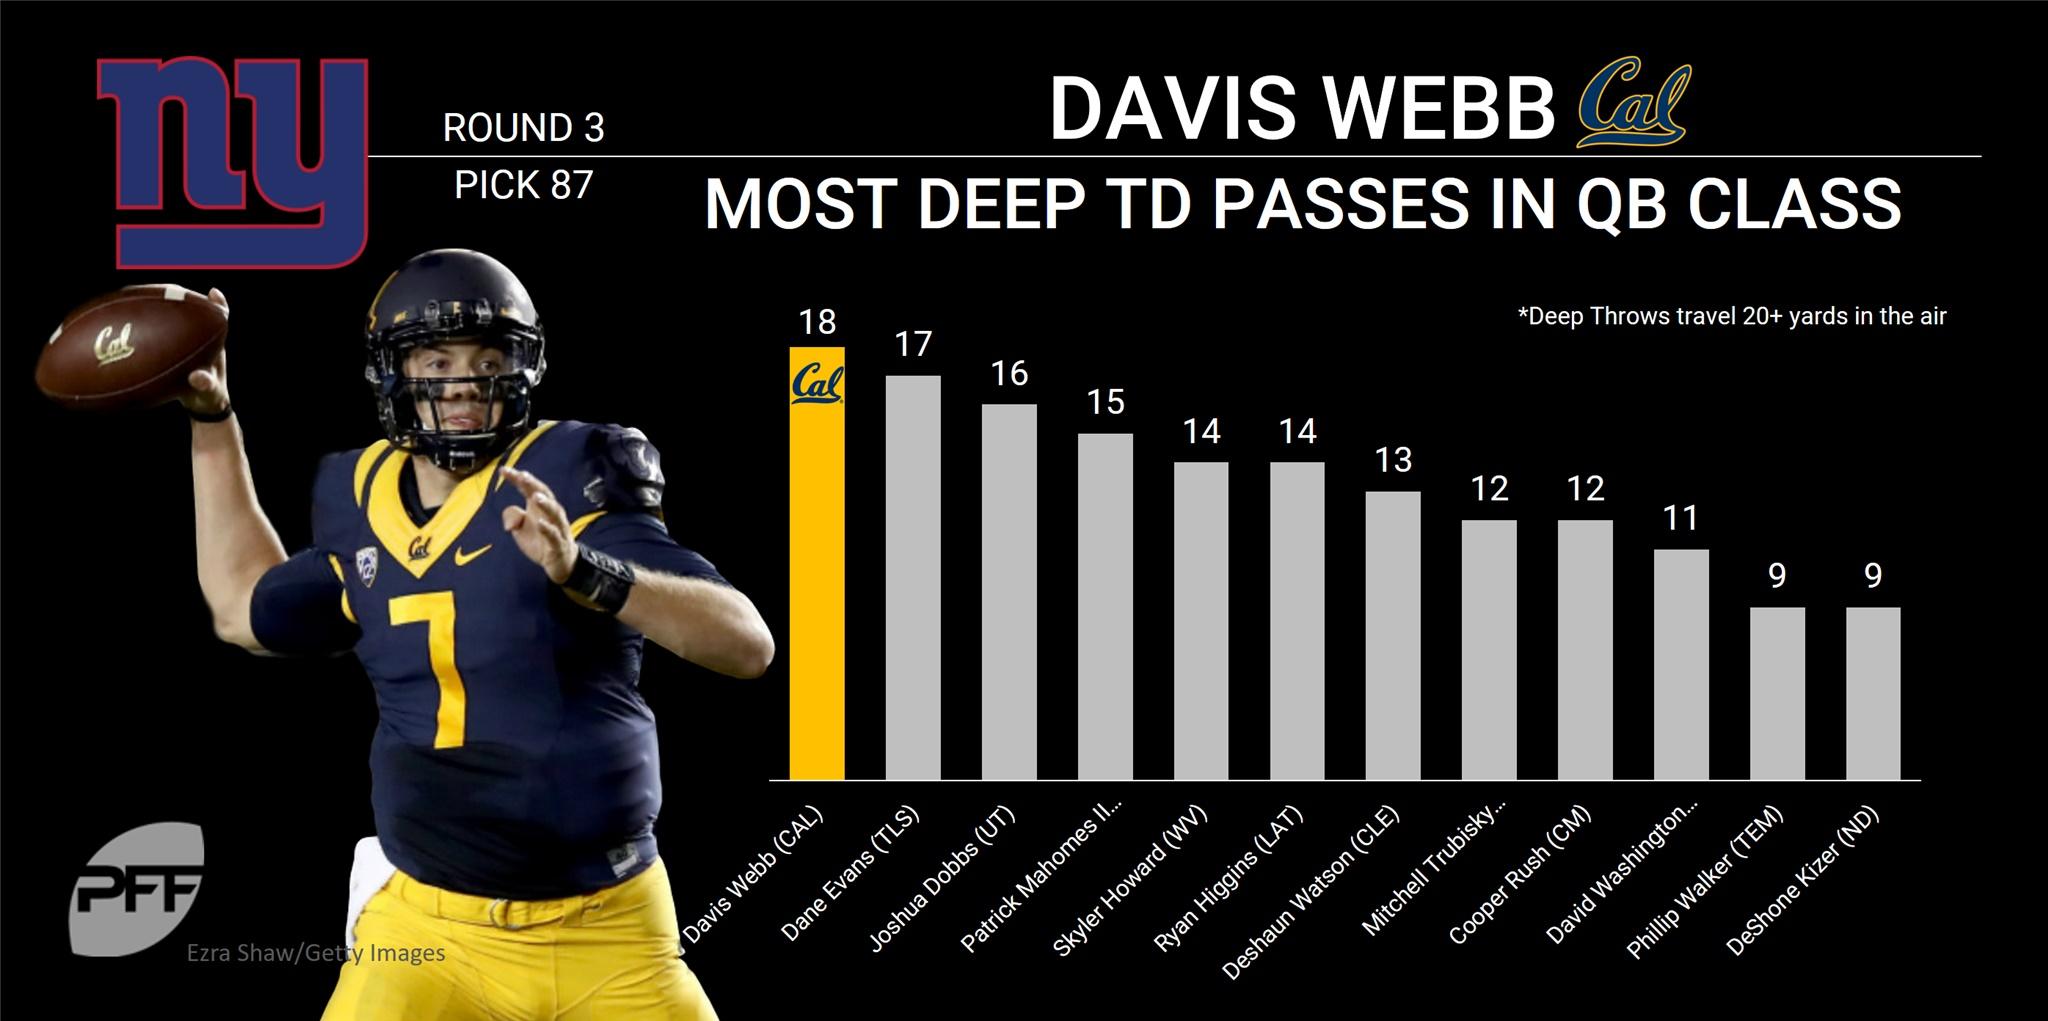 Davis Webb